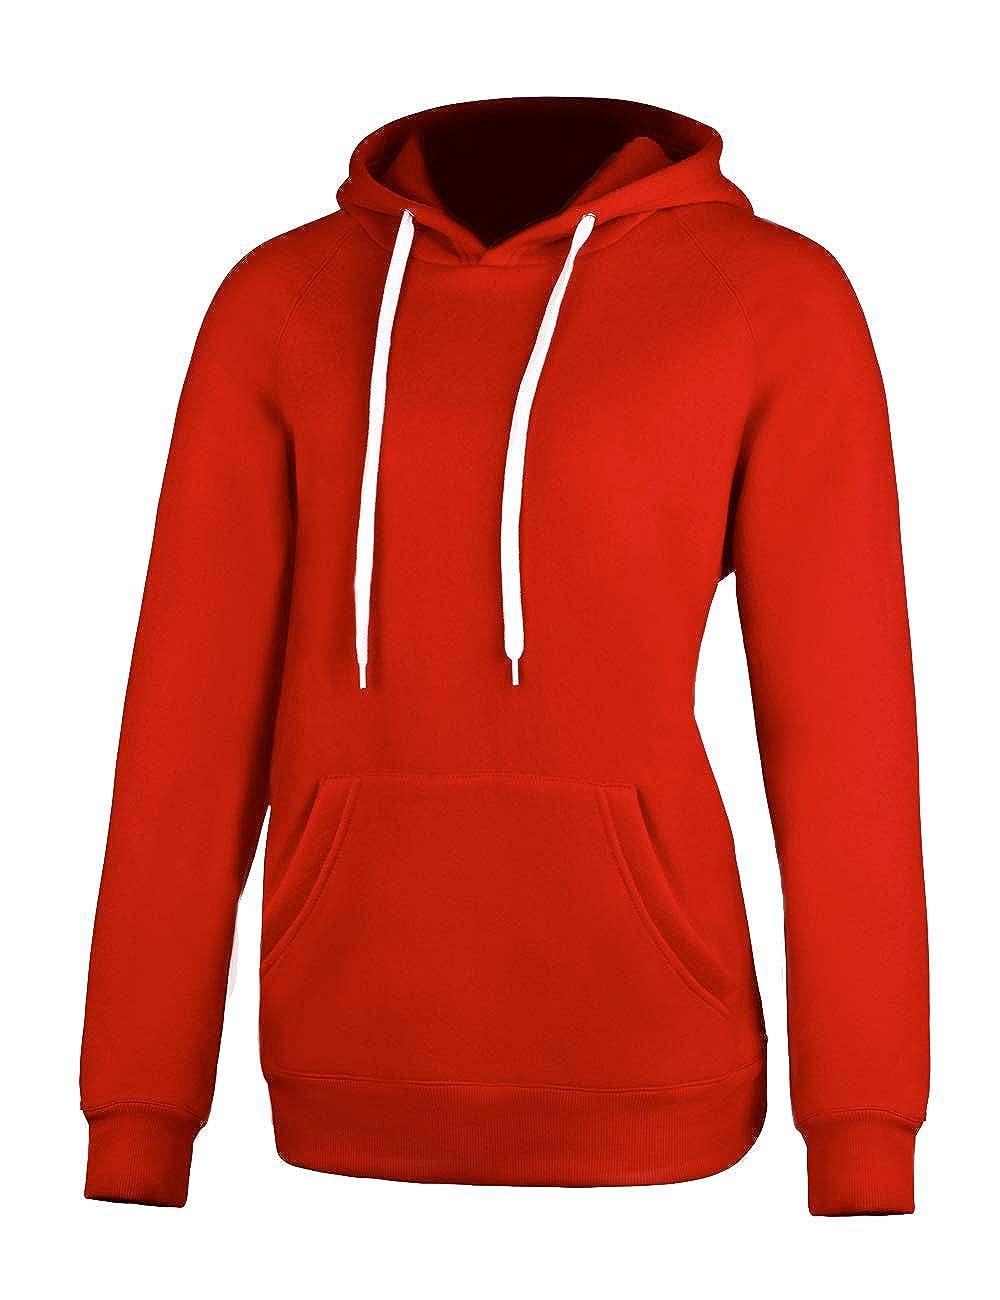 Chenghe Women's Blend Fleece Jersey Hoodie Sweatshirt Pocket Prime WJN066 CHWJN066